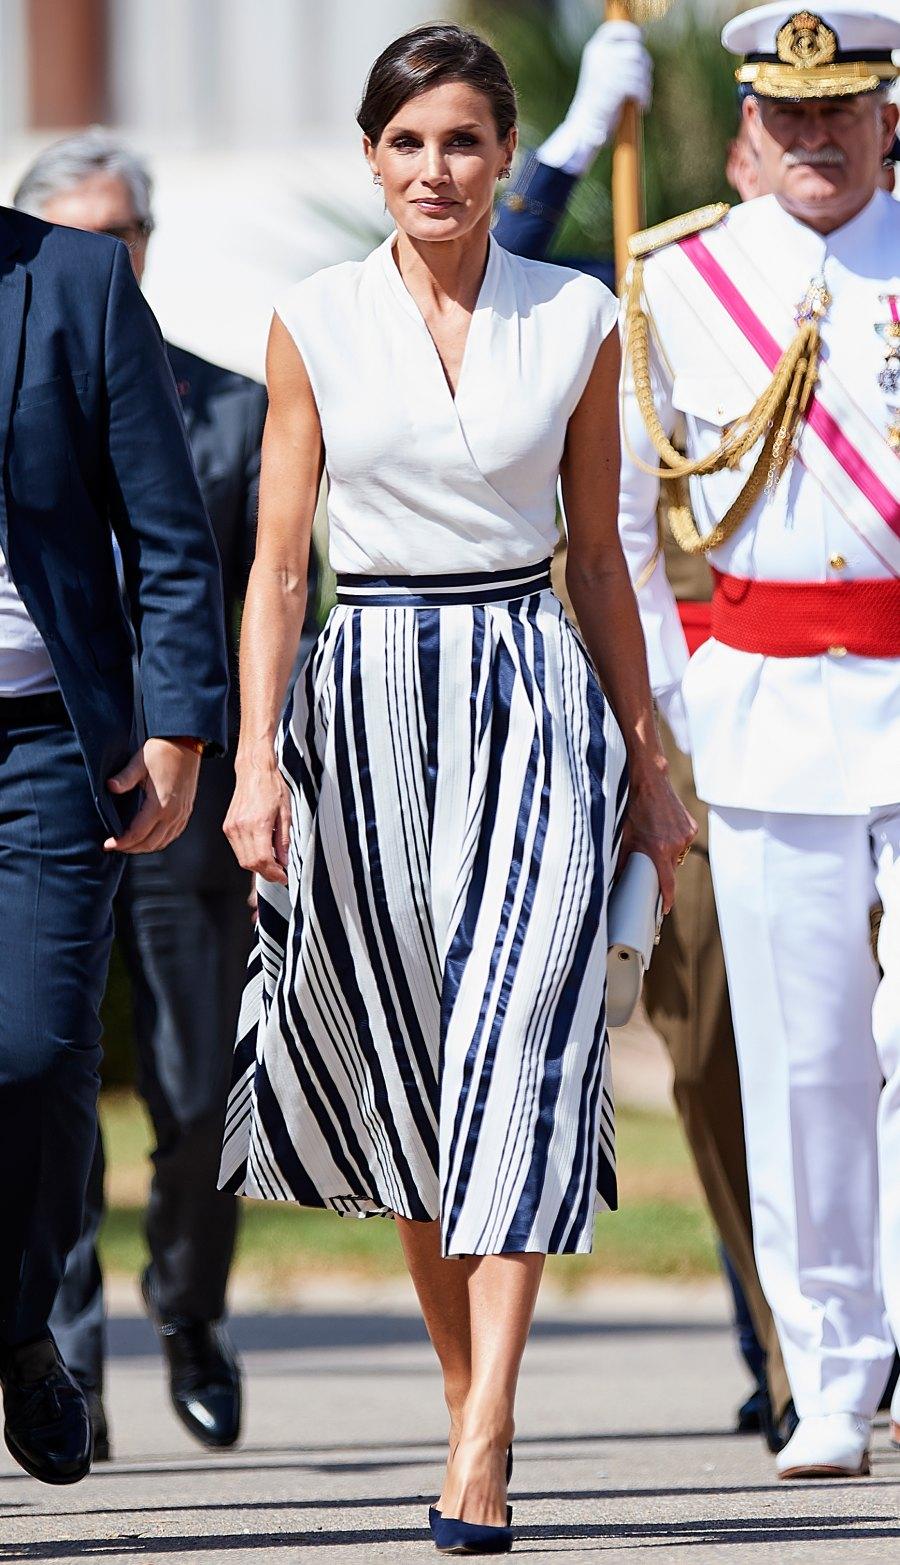 Queen Letizia Striped Look July 11, 2019